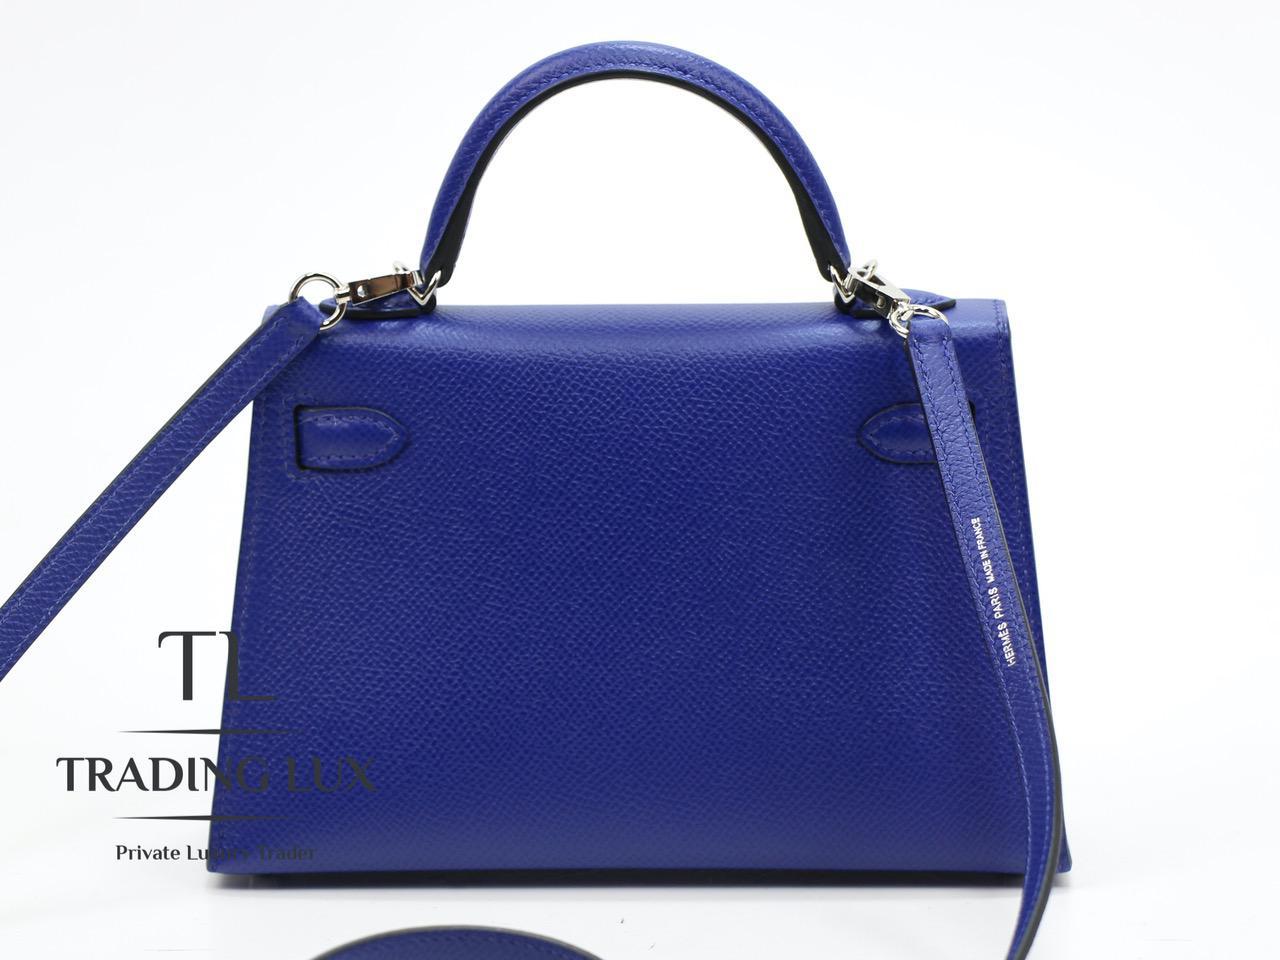 ermès-Mini-Kelly-20-Blue-Electric-4-1